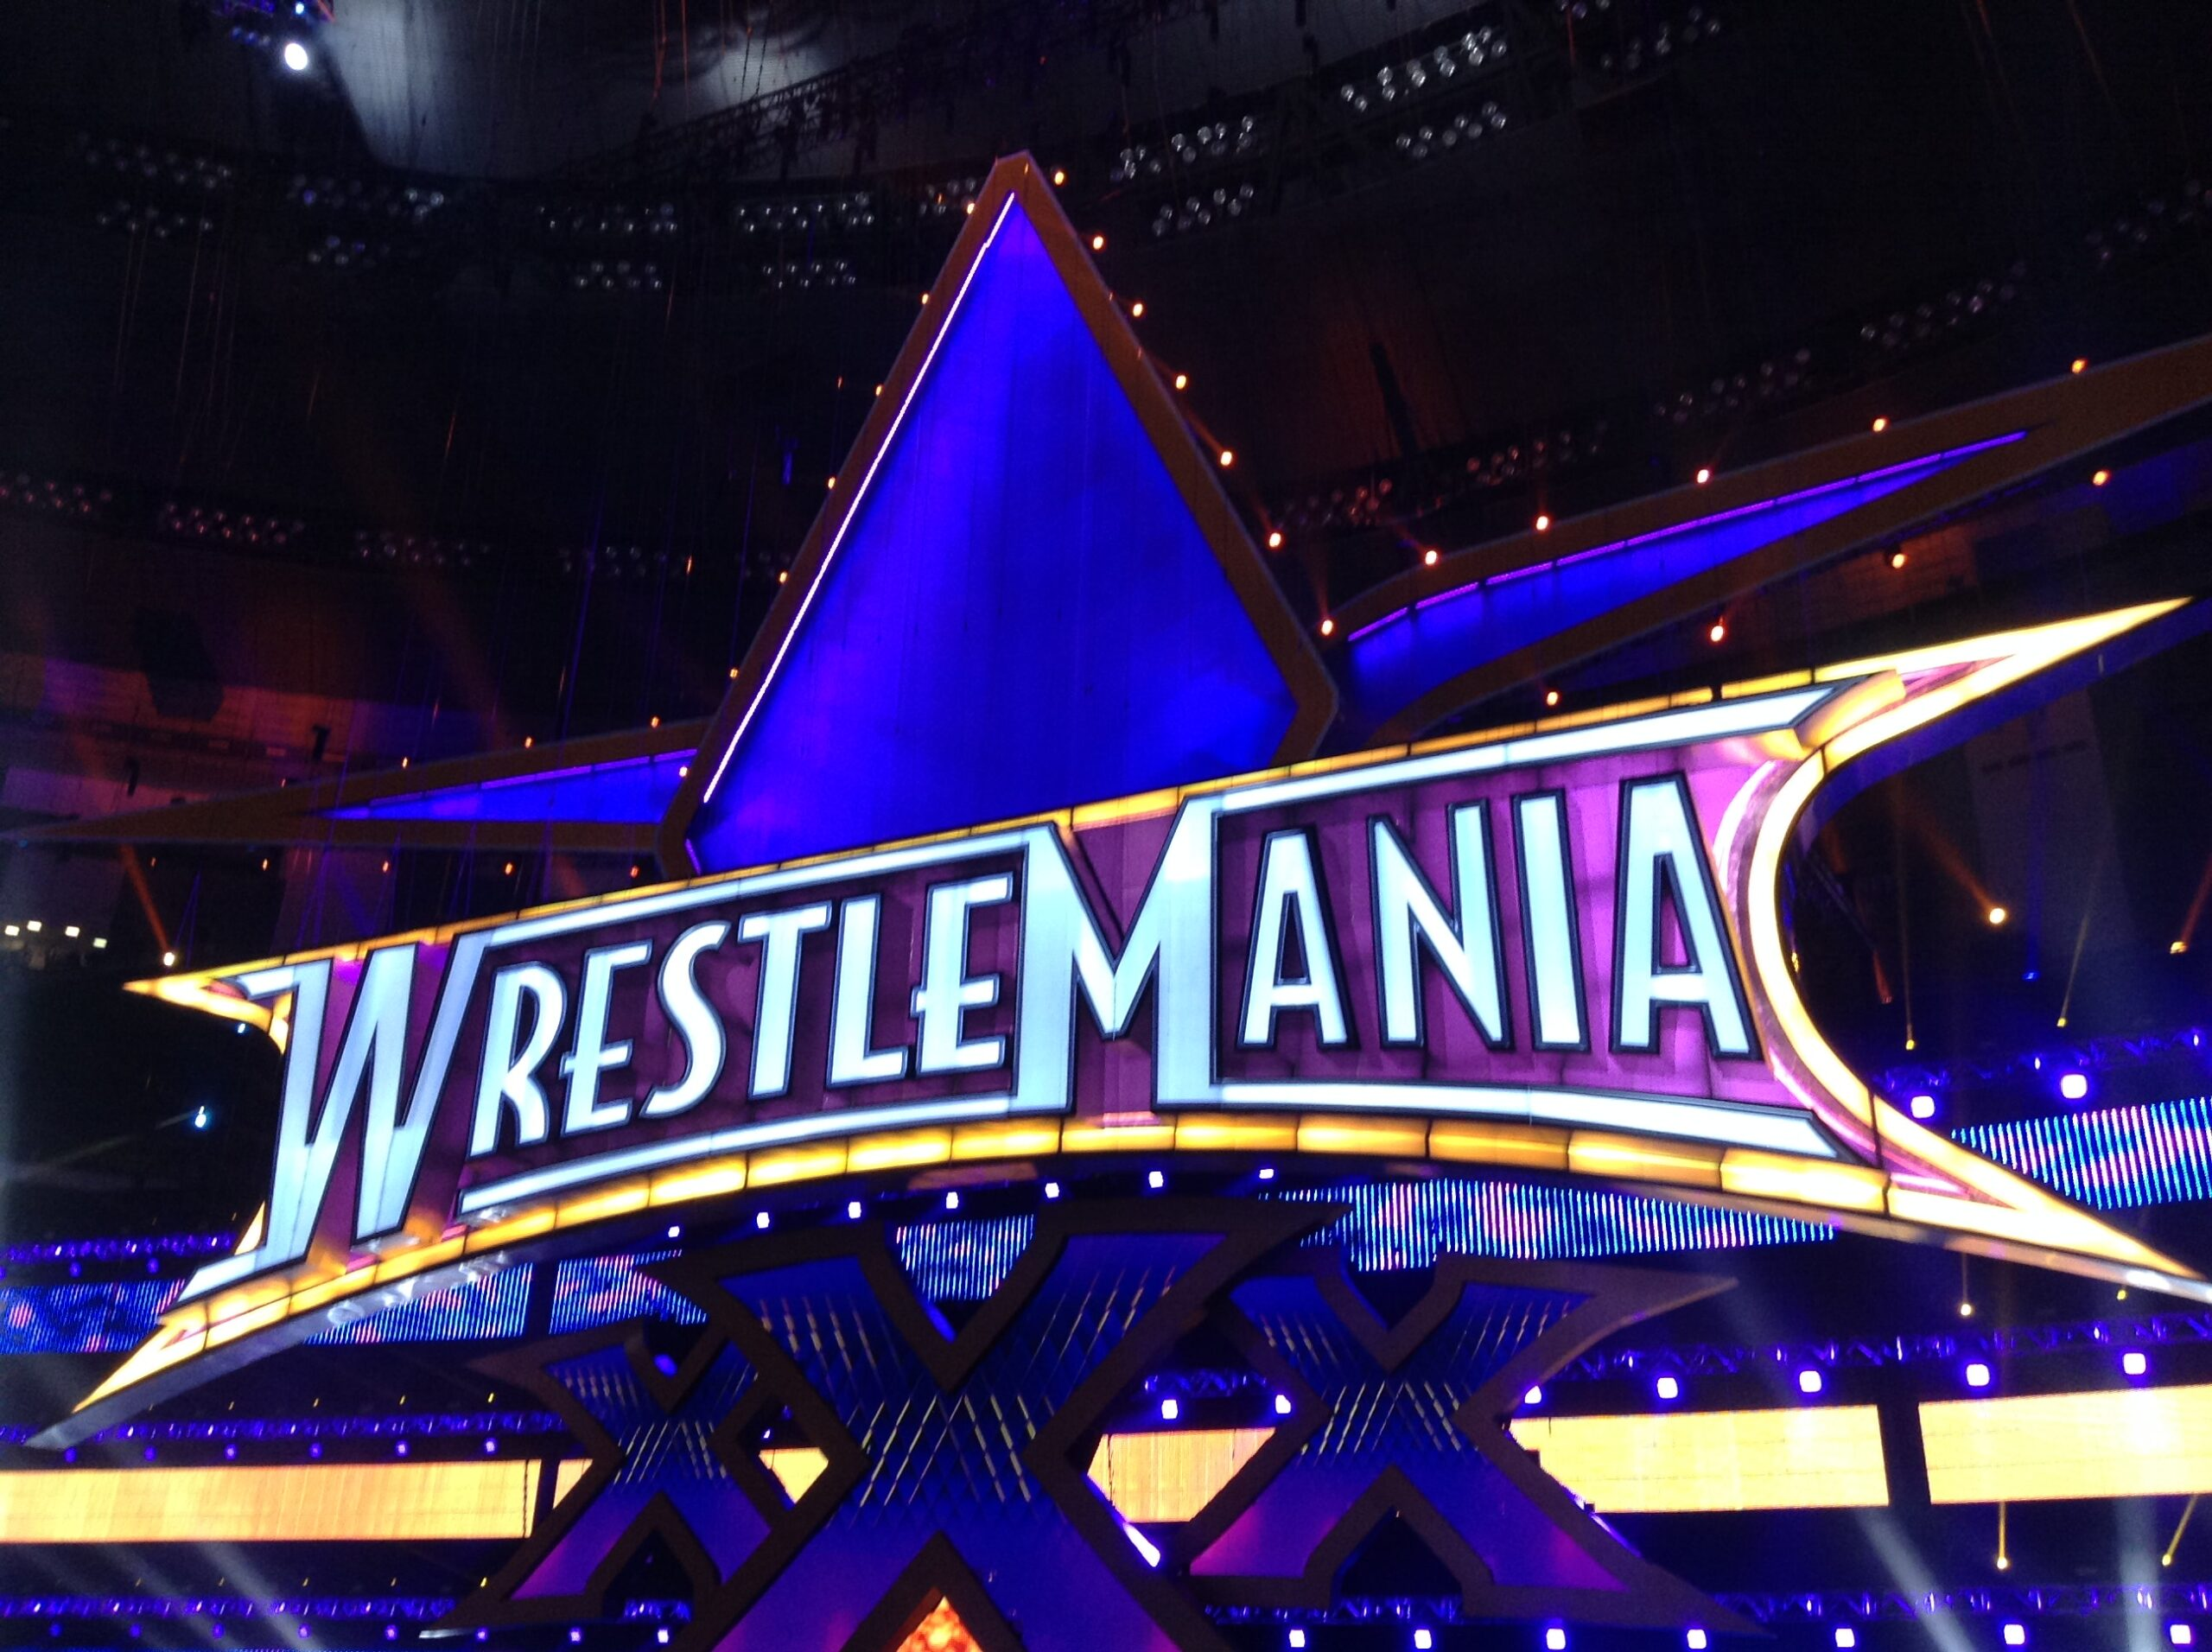 Propmasters Wrestlemania set 1